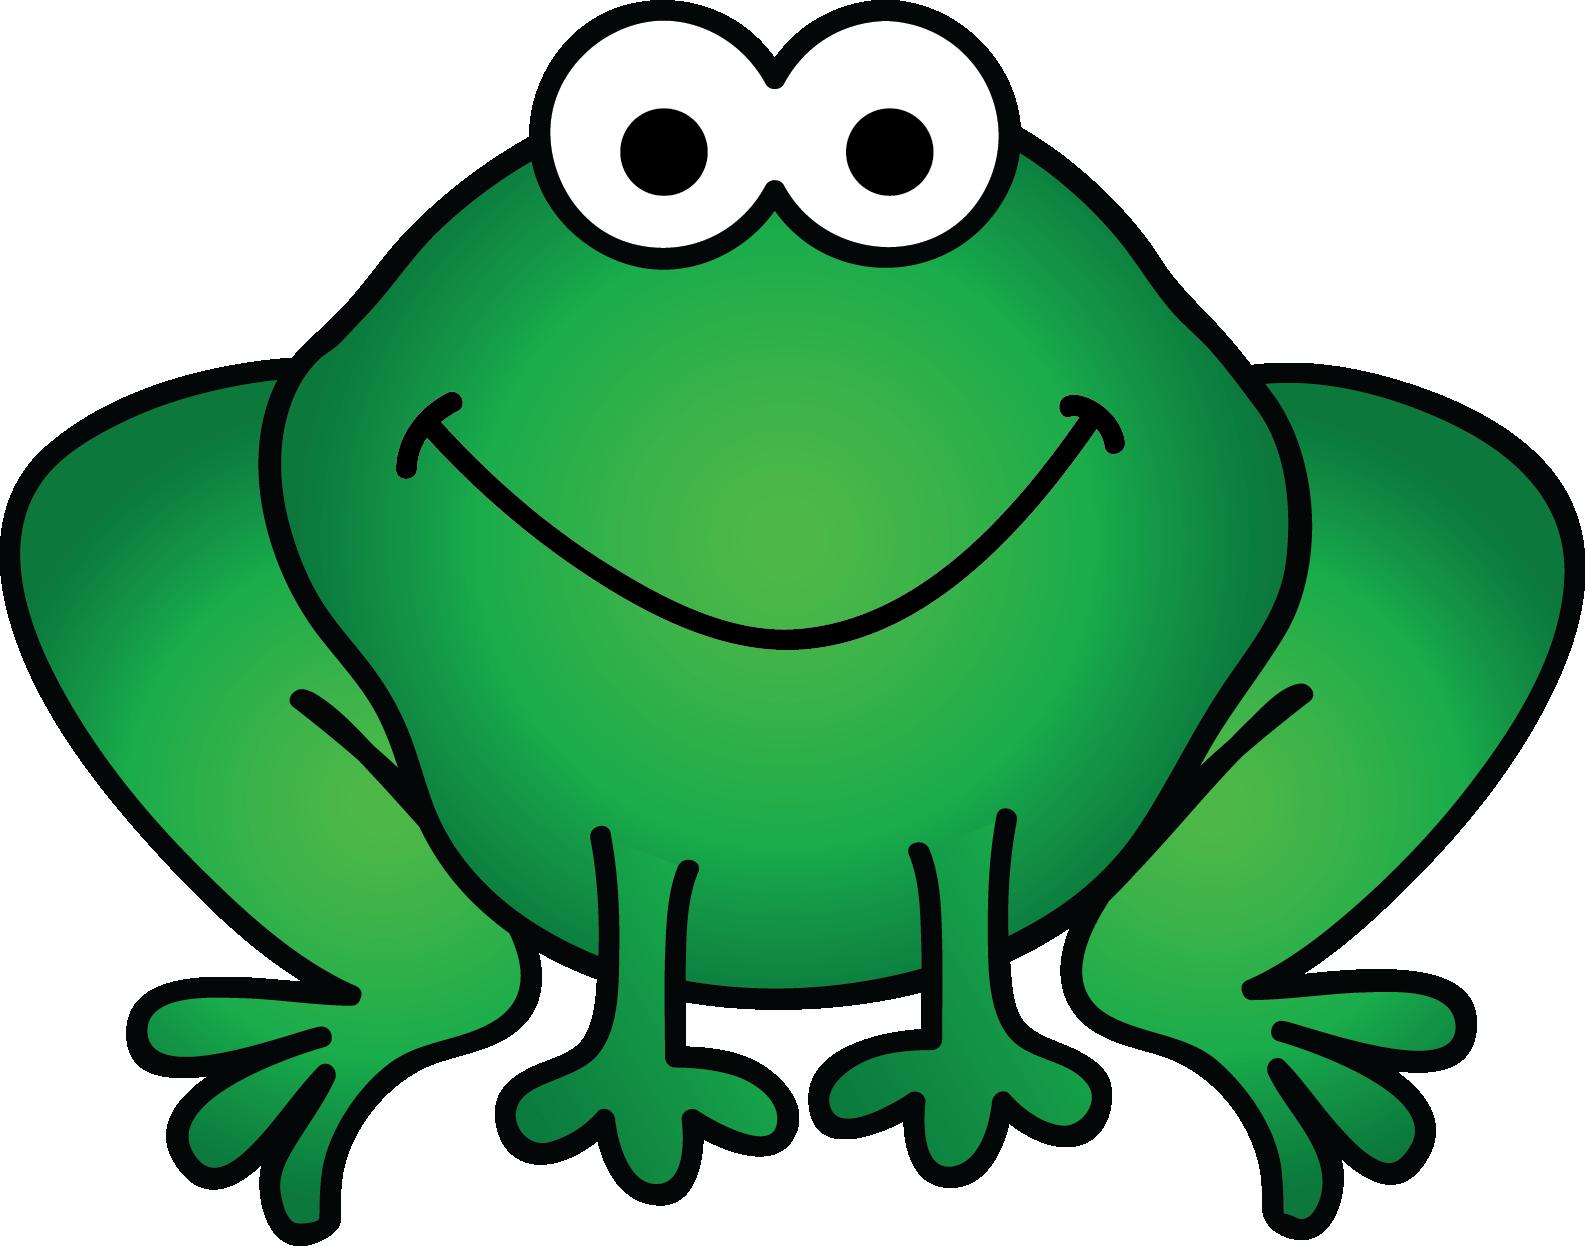 Clocks to the hour. Frog clipart teacher